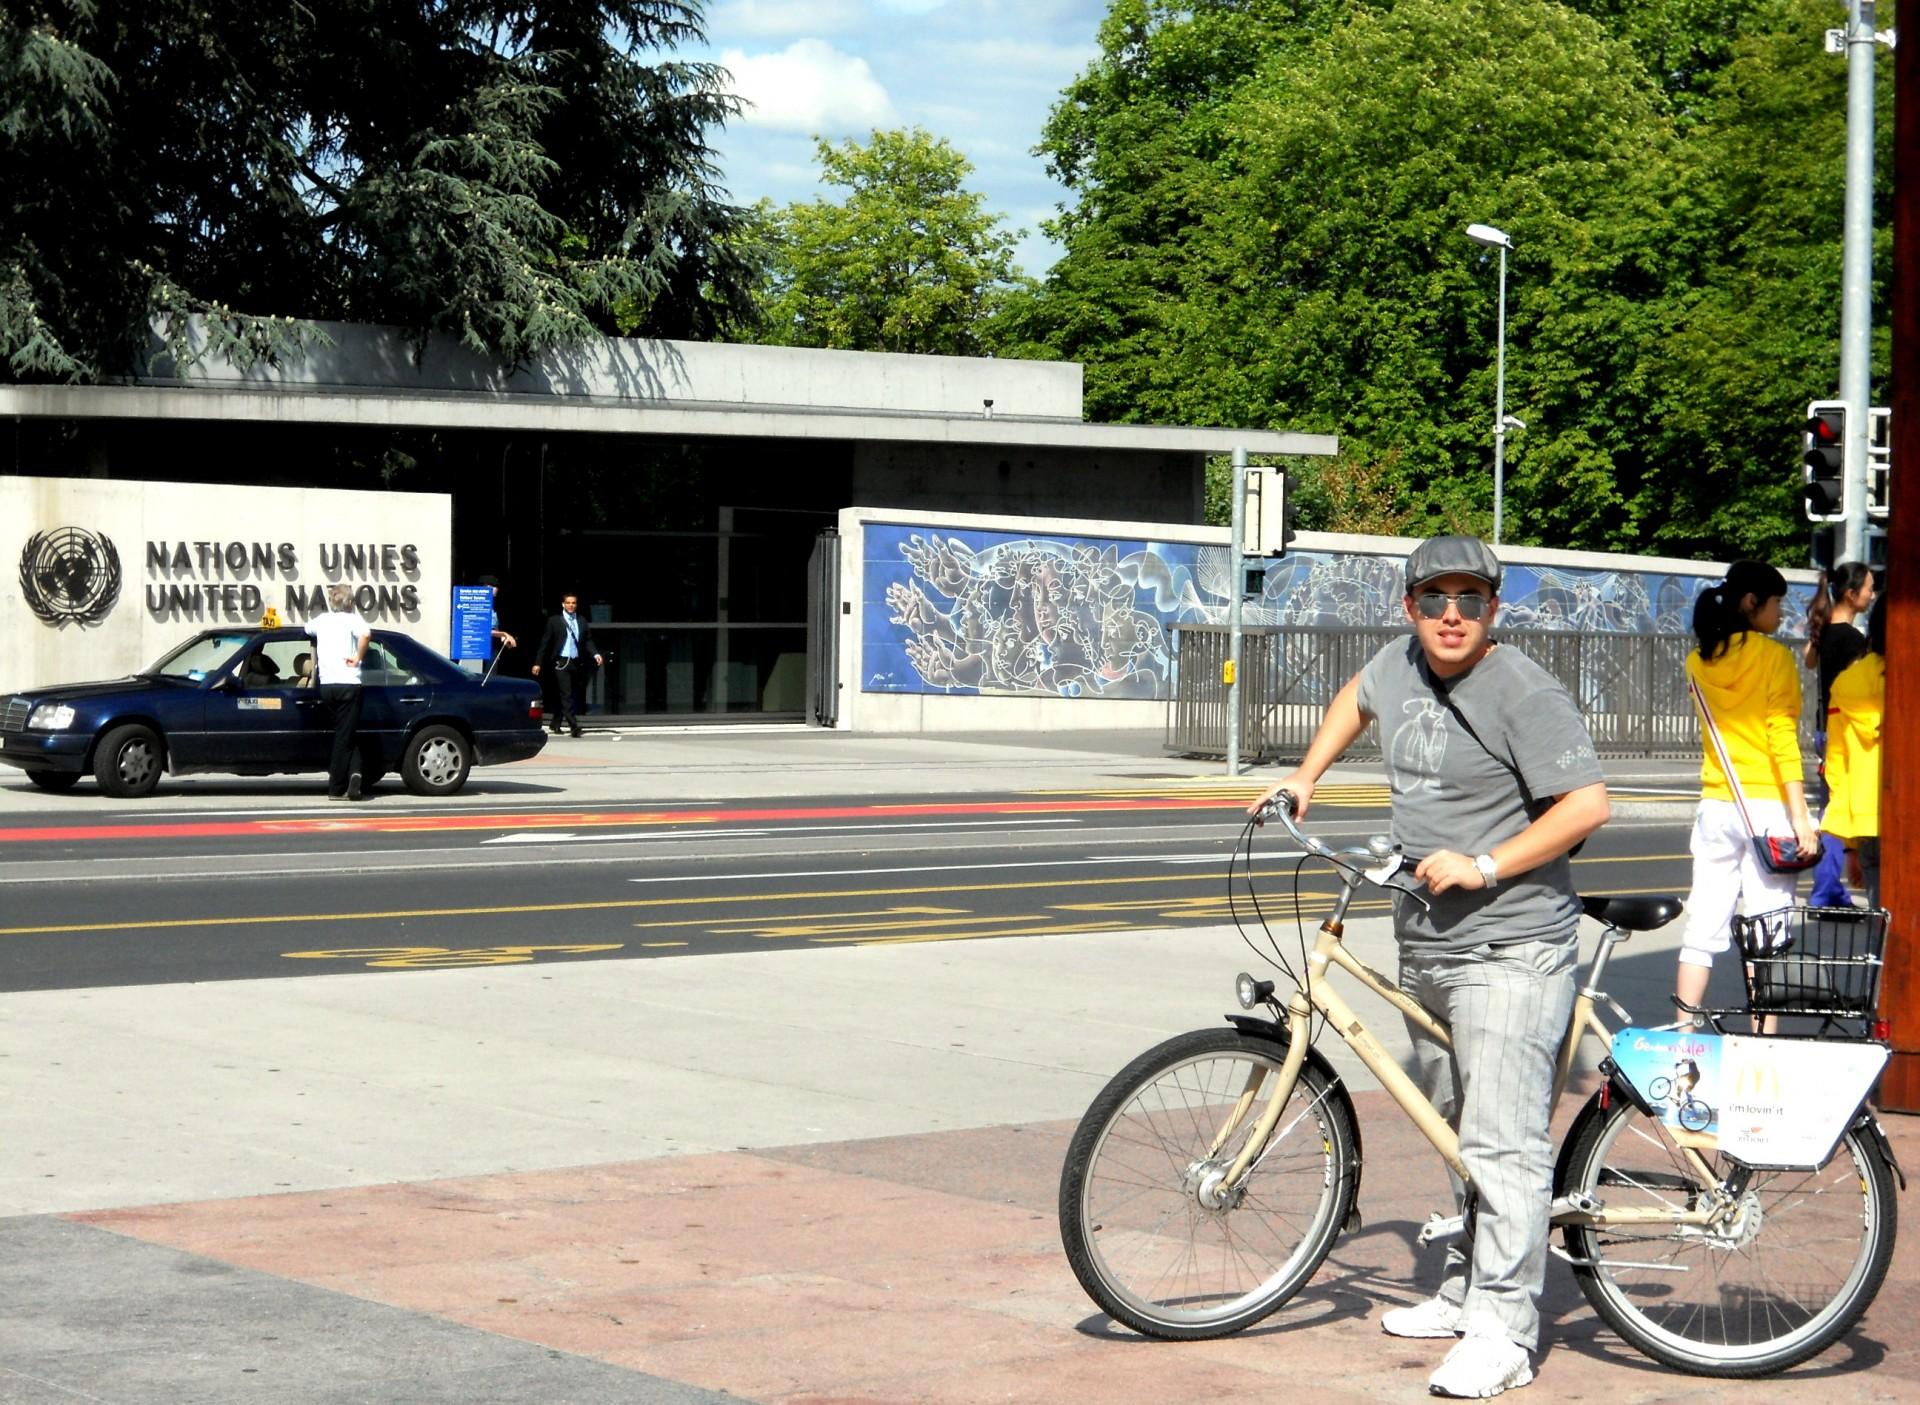 Gustavo de bike em frente a ONU na Place des Nations em Genebra